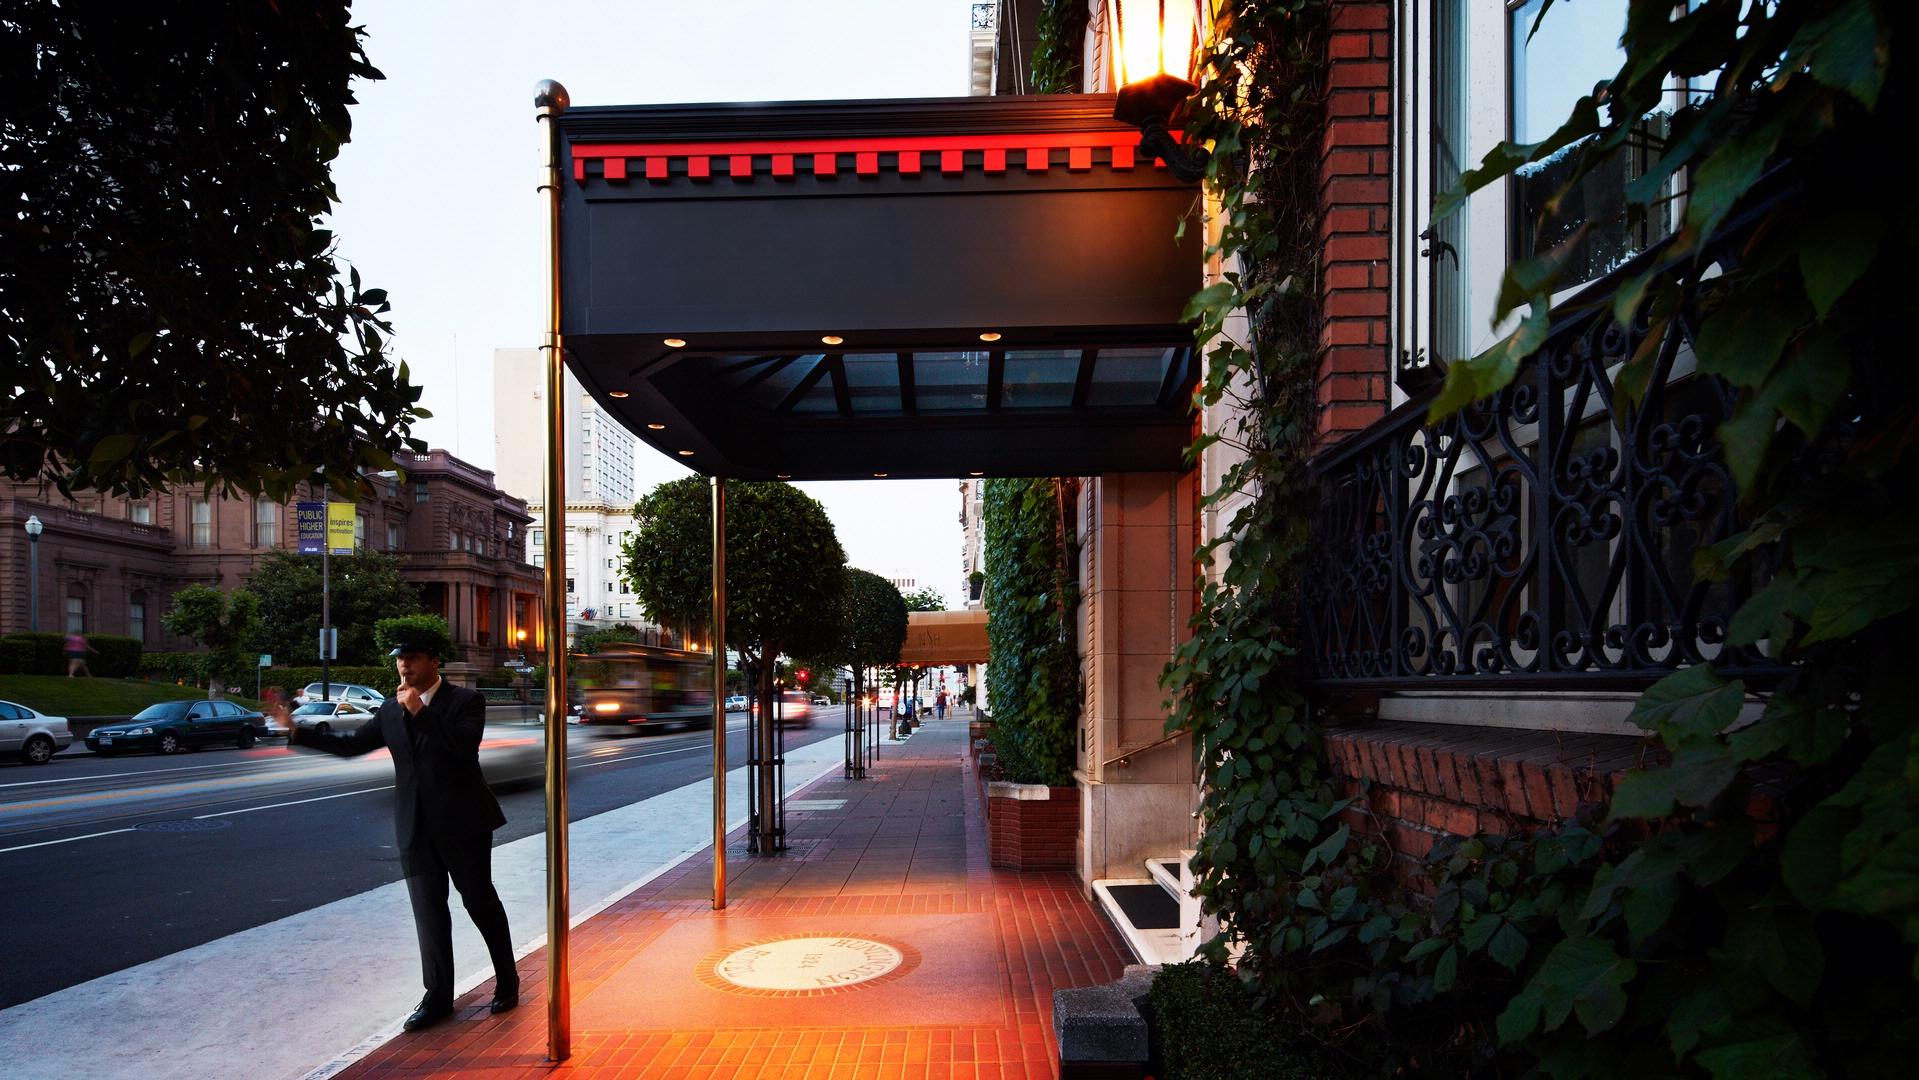 San Francisco Hotel in Nob Hill - Huntington Hotel